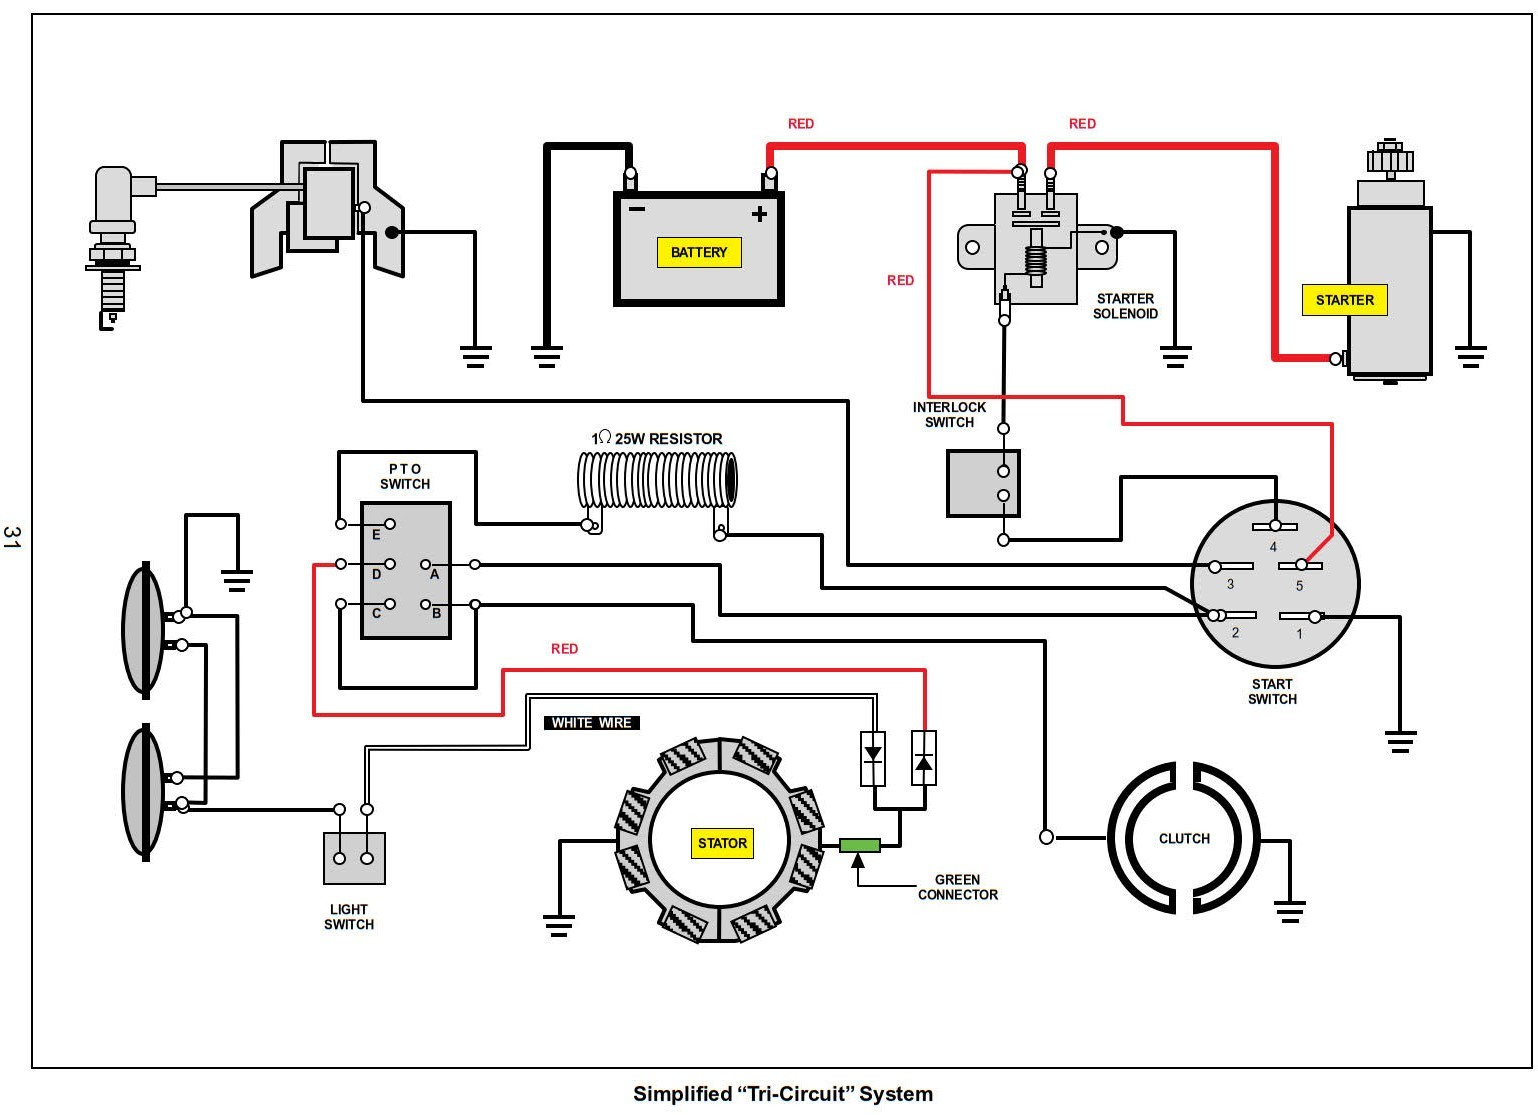 tri circuit wiring diagram 2